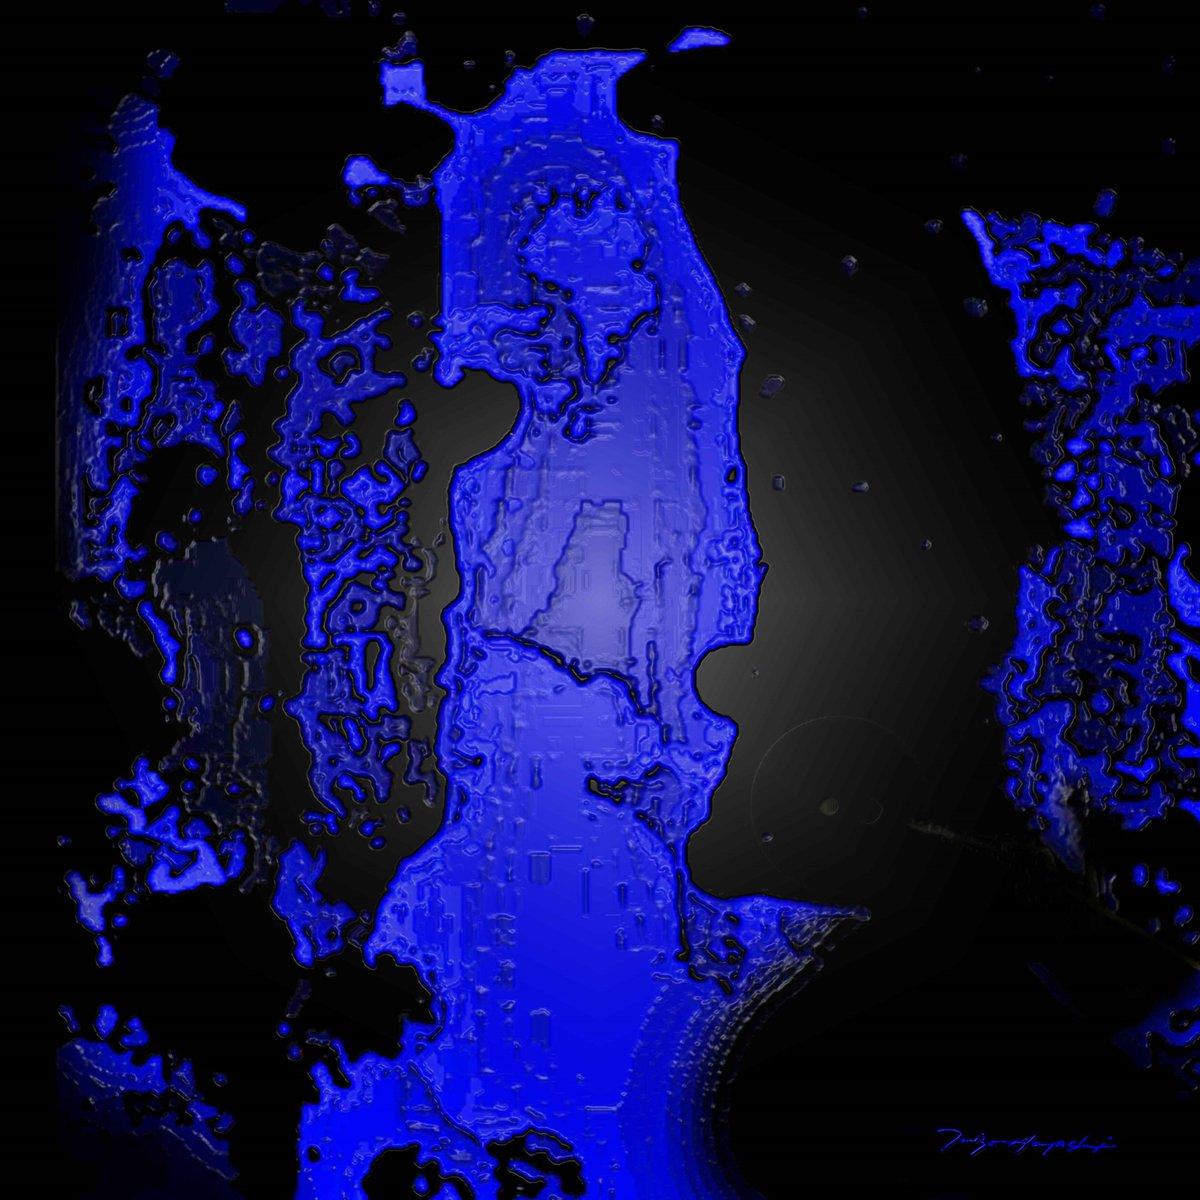 Midnight Blue - XXY ;  Taizo Hayashi ; Japan    #art #arte #abstractpainting #digitalpainting #digitalart  #contemporarypainting #contemporaryart  #絵描きさんと繋がたい #抽象画 #デジタル絵画  #デジタル #アート #絵画pic.twitter.com/Ch8PhgZTzh